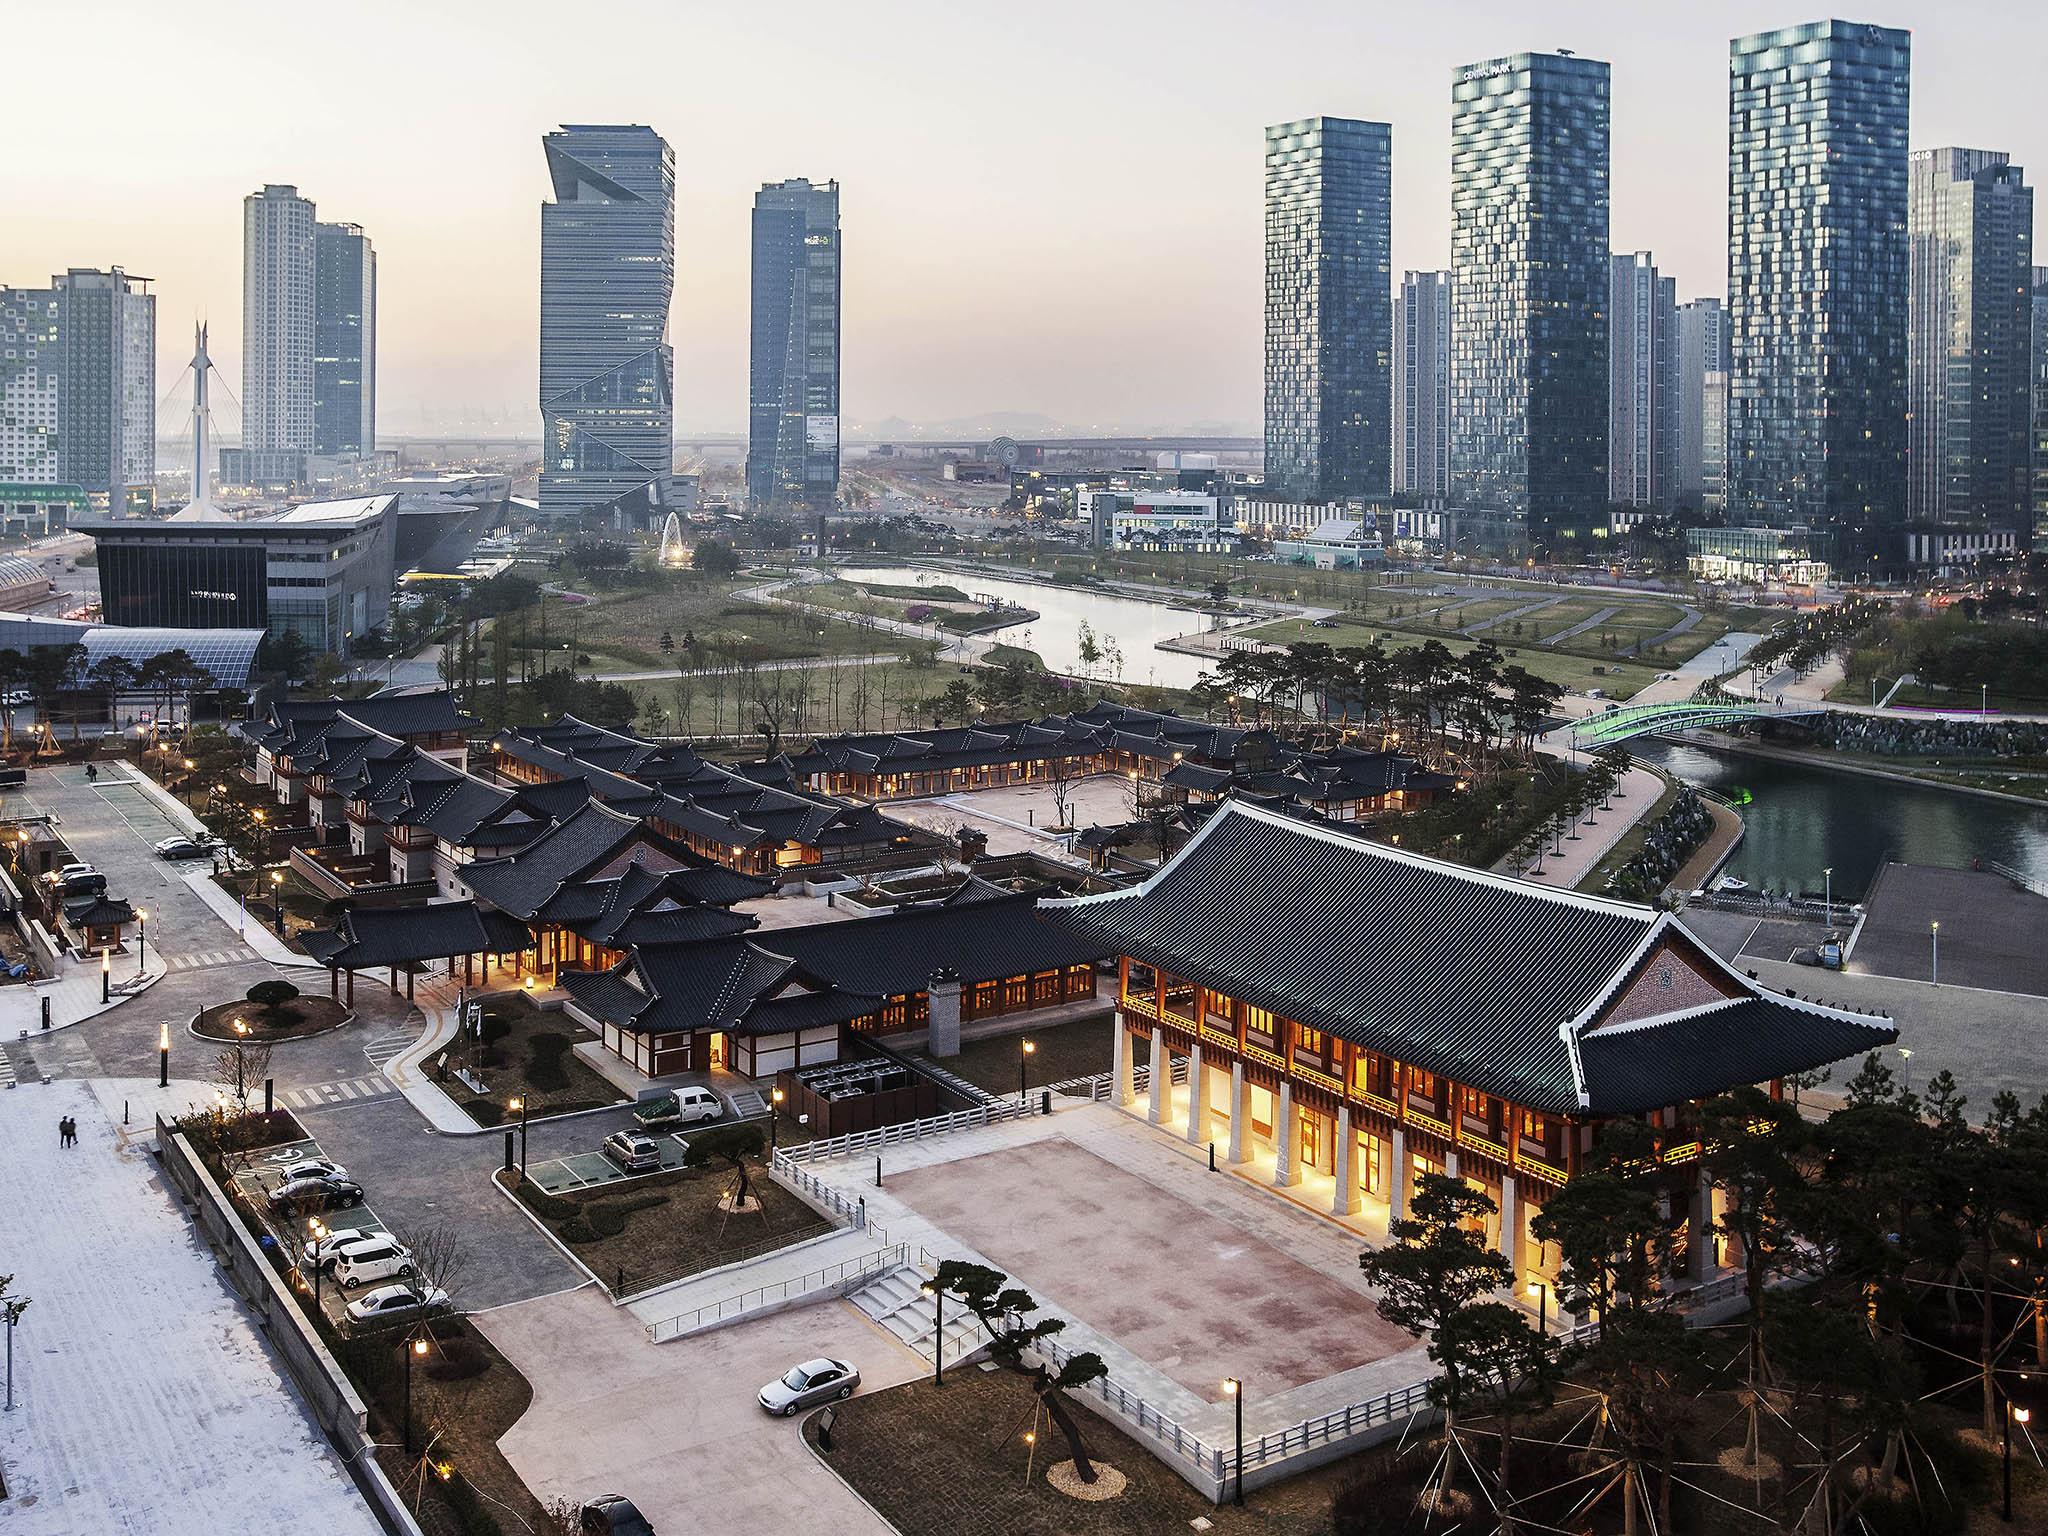 Hotel – Gyeongwonjae Ambassador Incheon - Associato ad AccorHotels